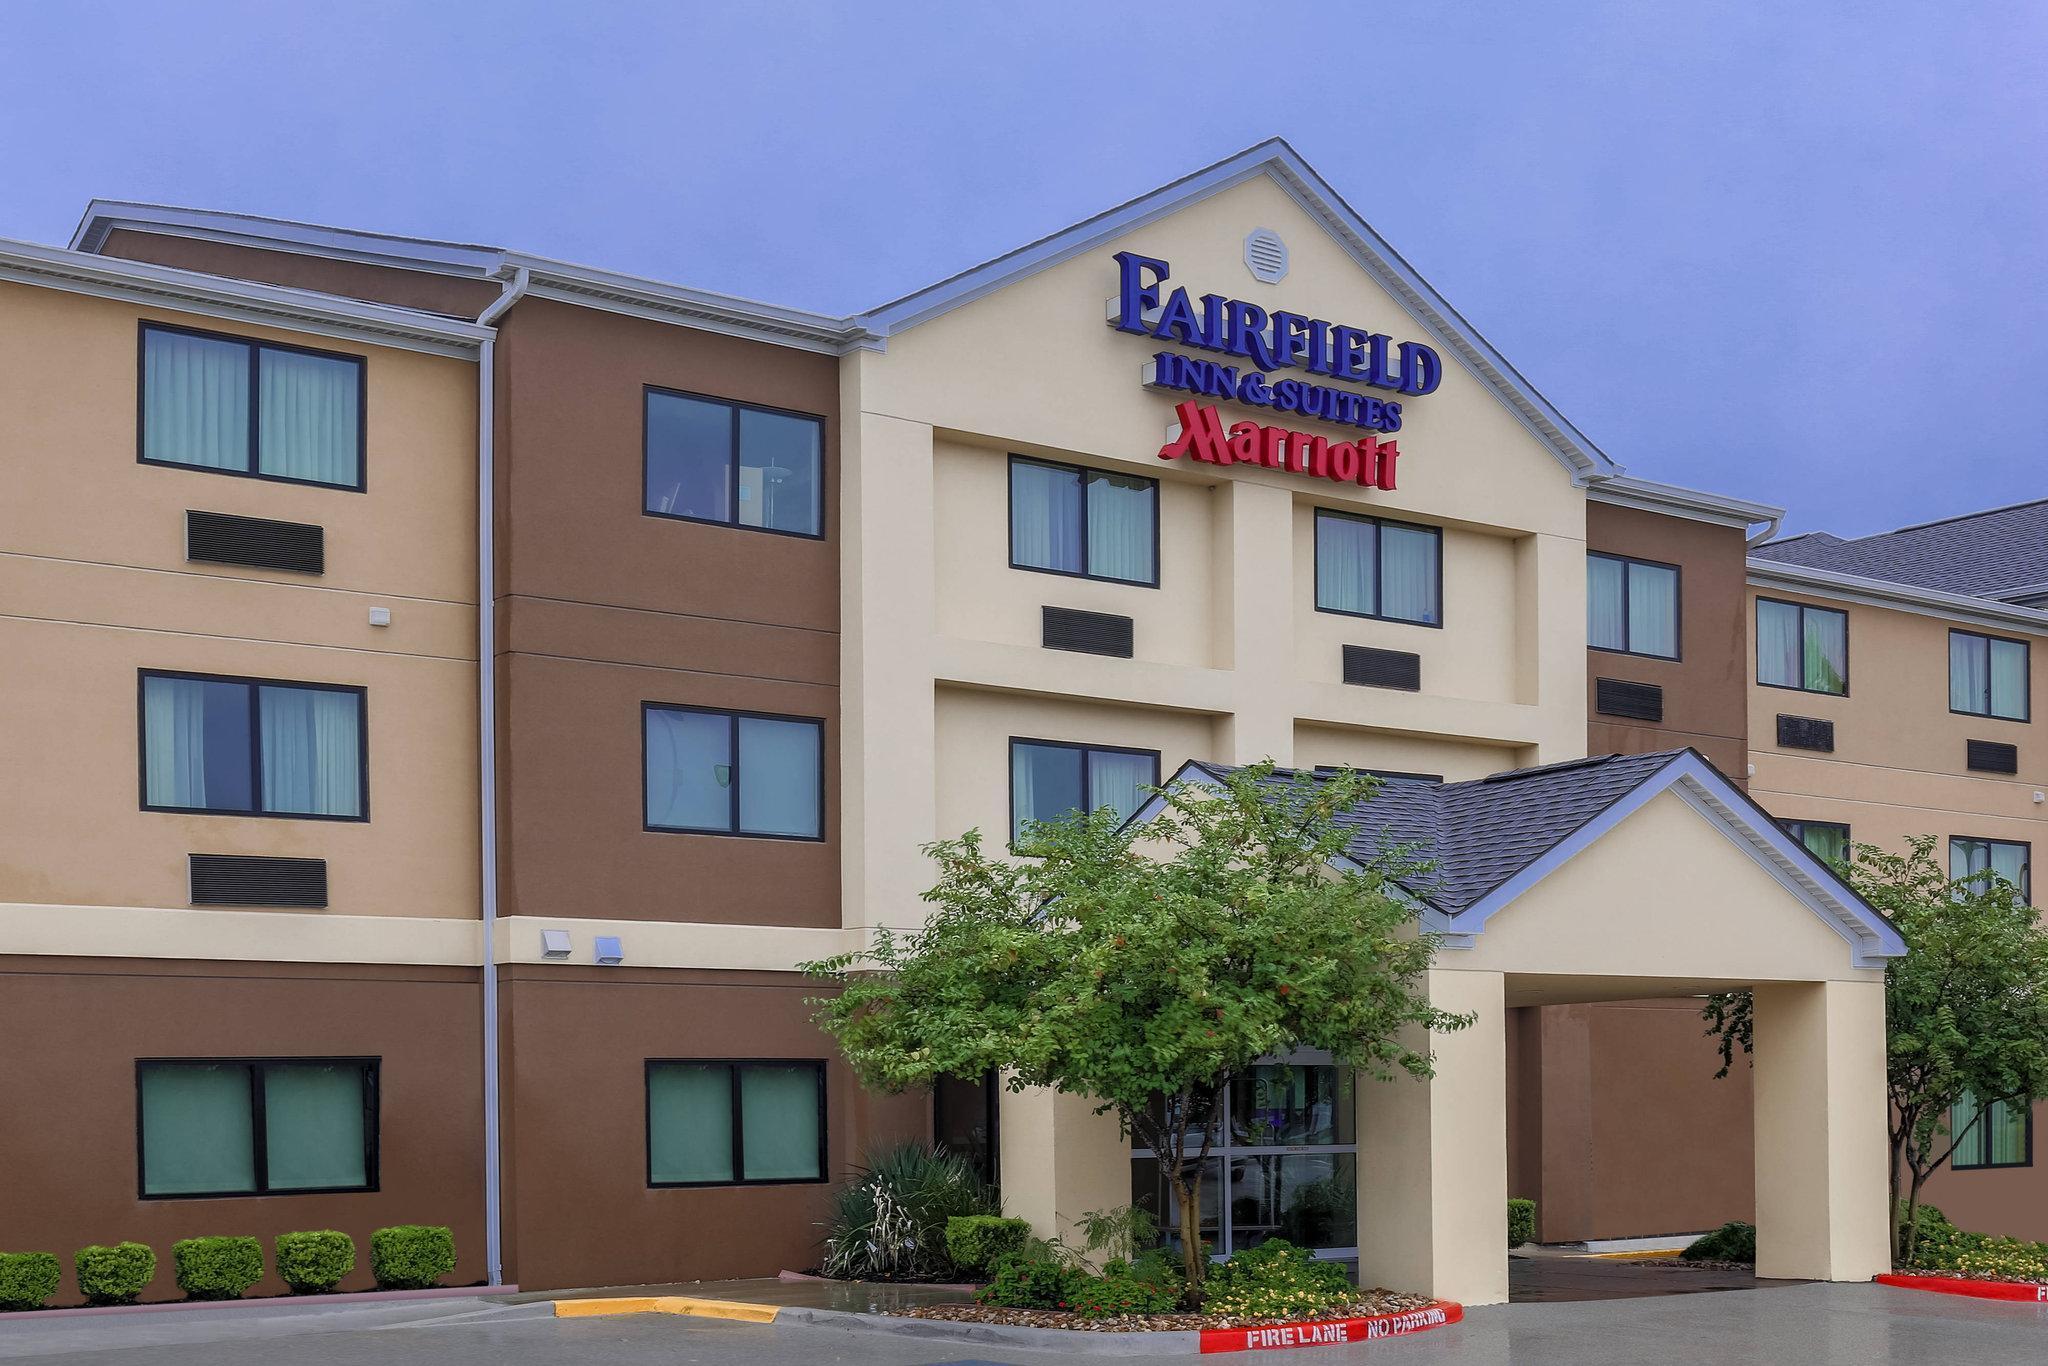 Fairfield Inn And Suites Victoria